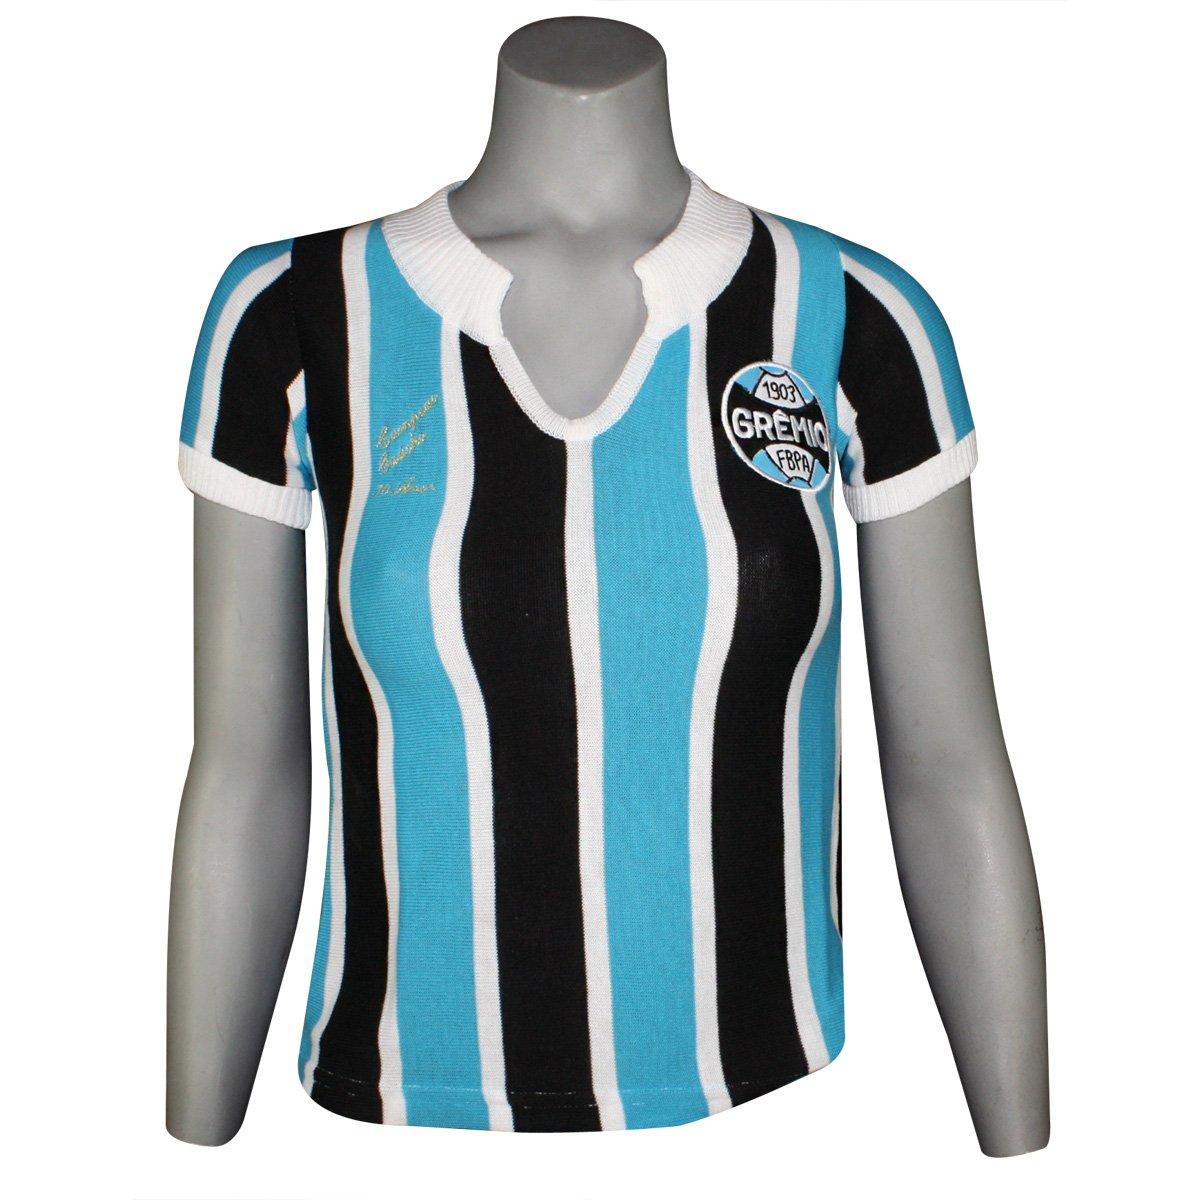 Camisa Feminina Dilva Oldoni Grêmio Retro Replica b385ccb0e050a